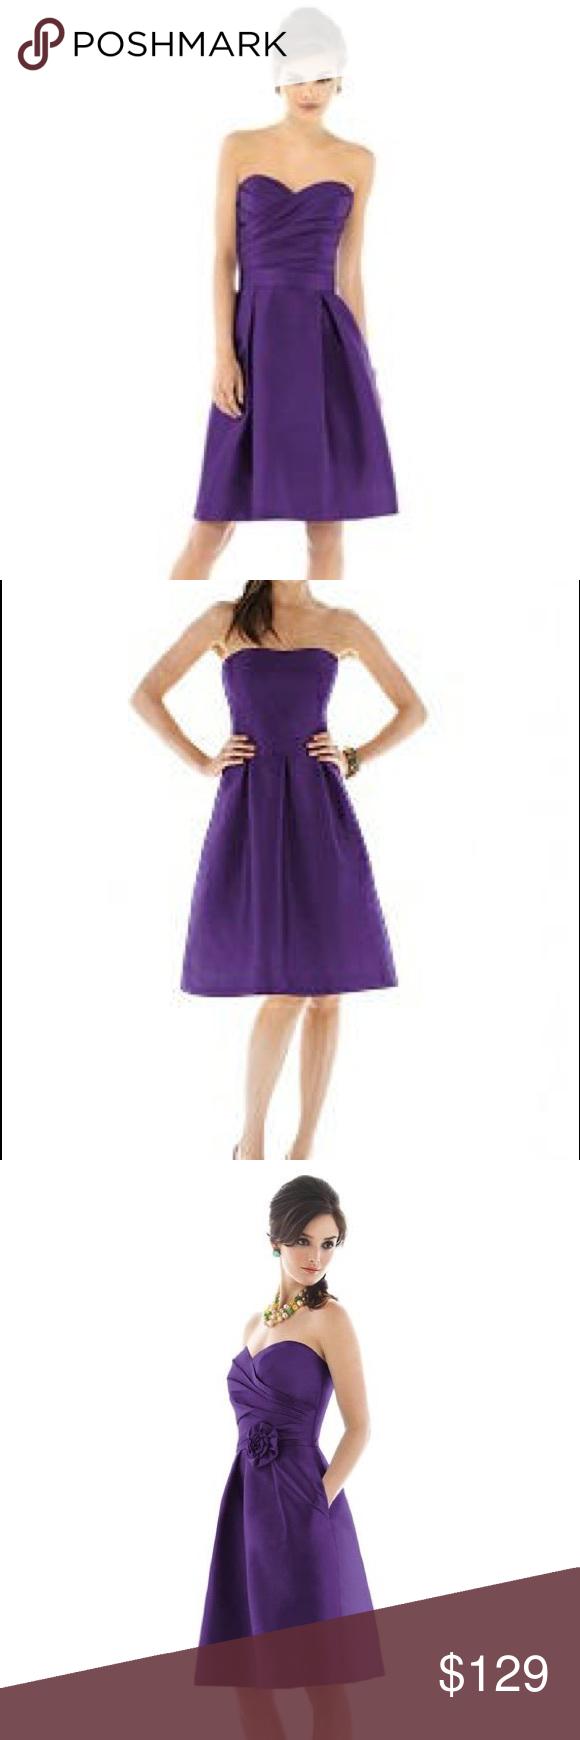 Alfred Sung Dress is flirty & fun